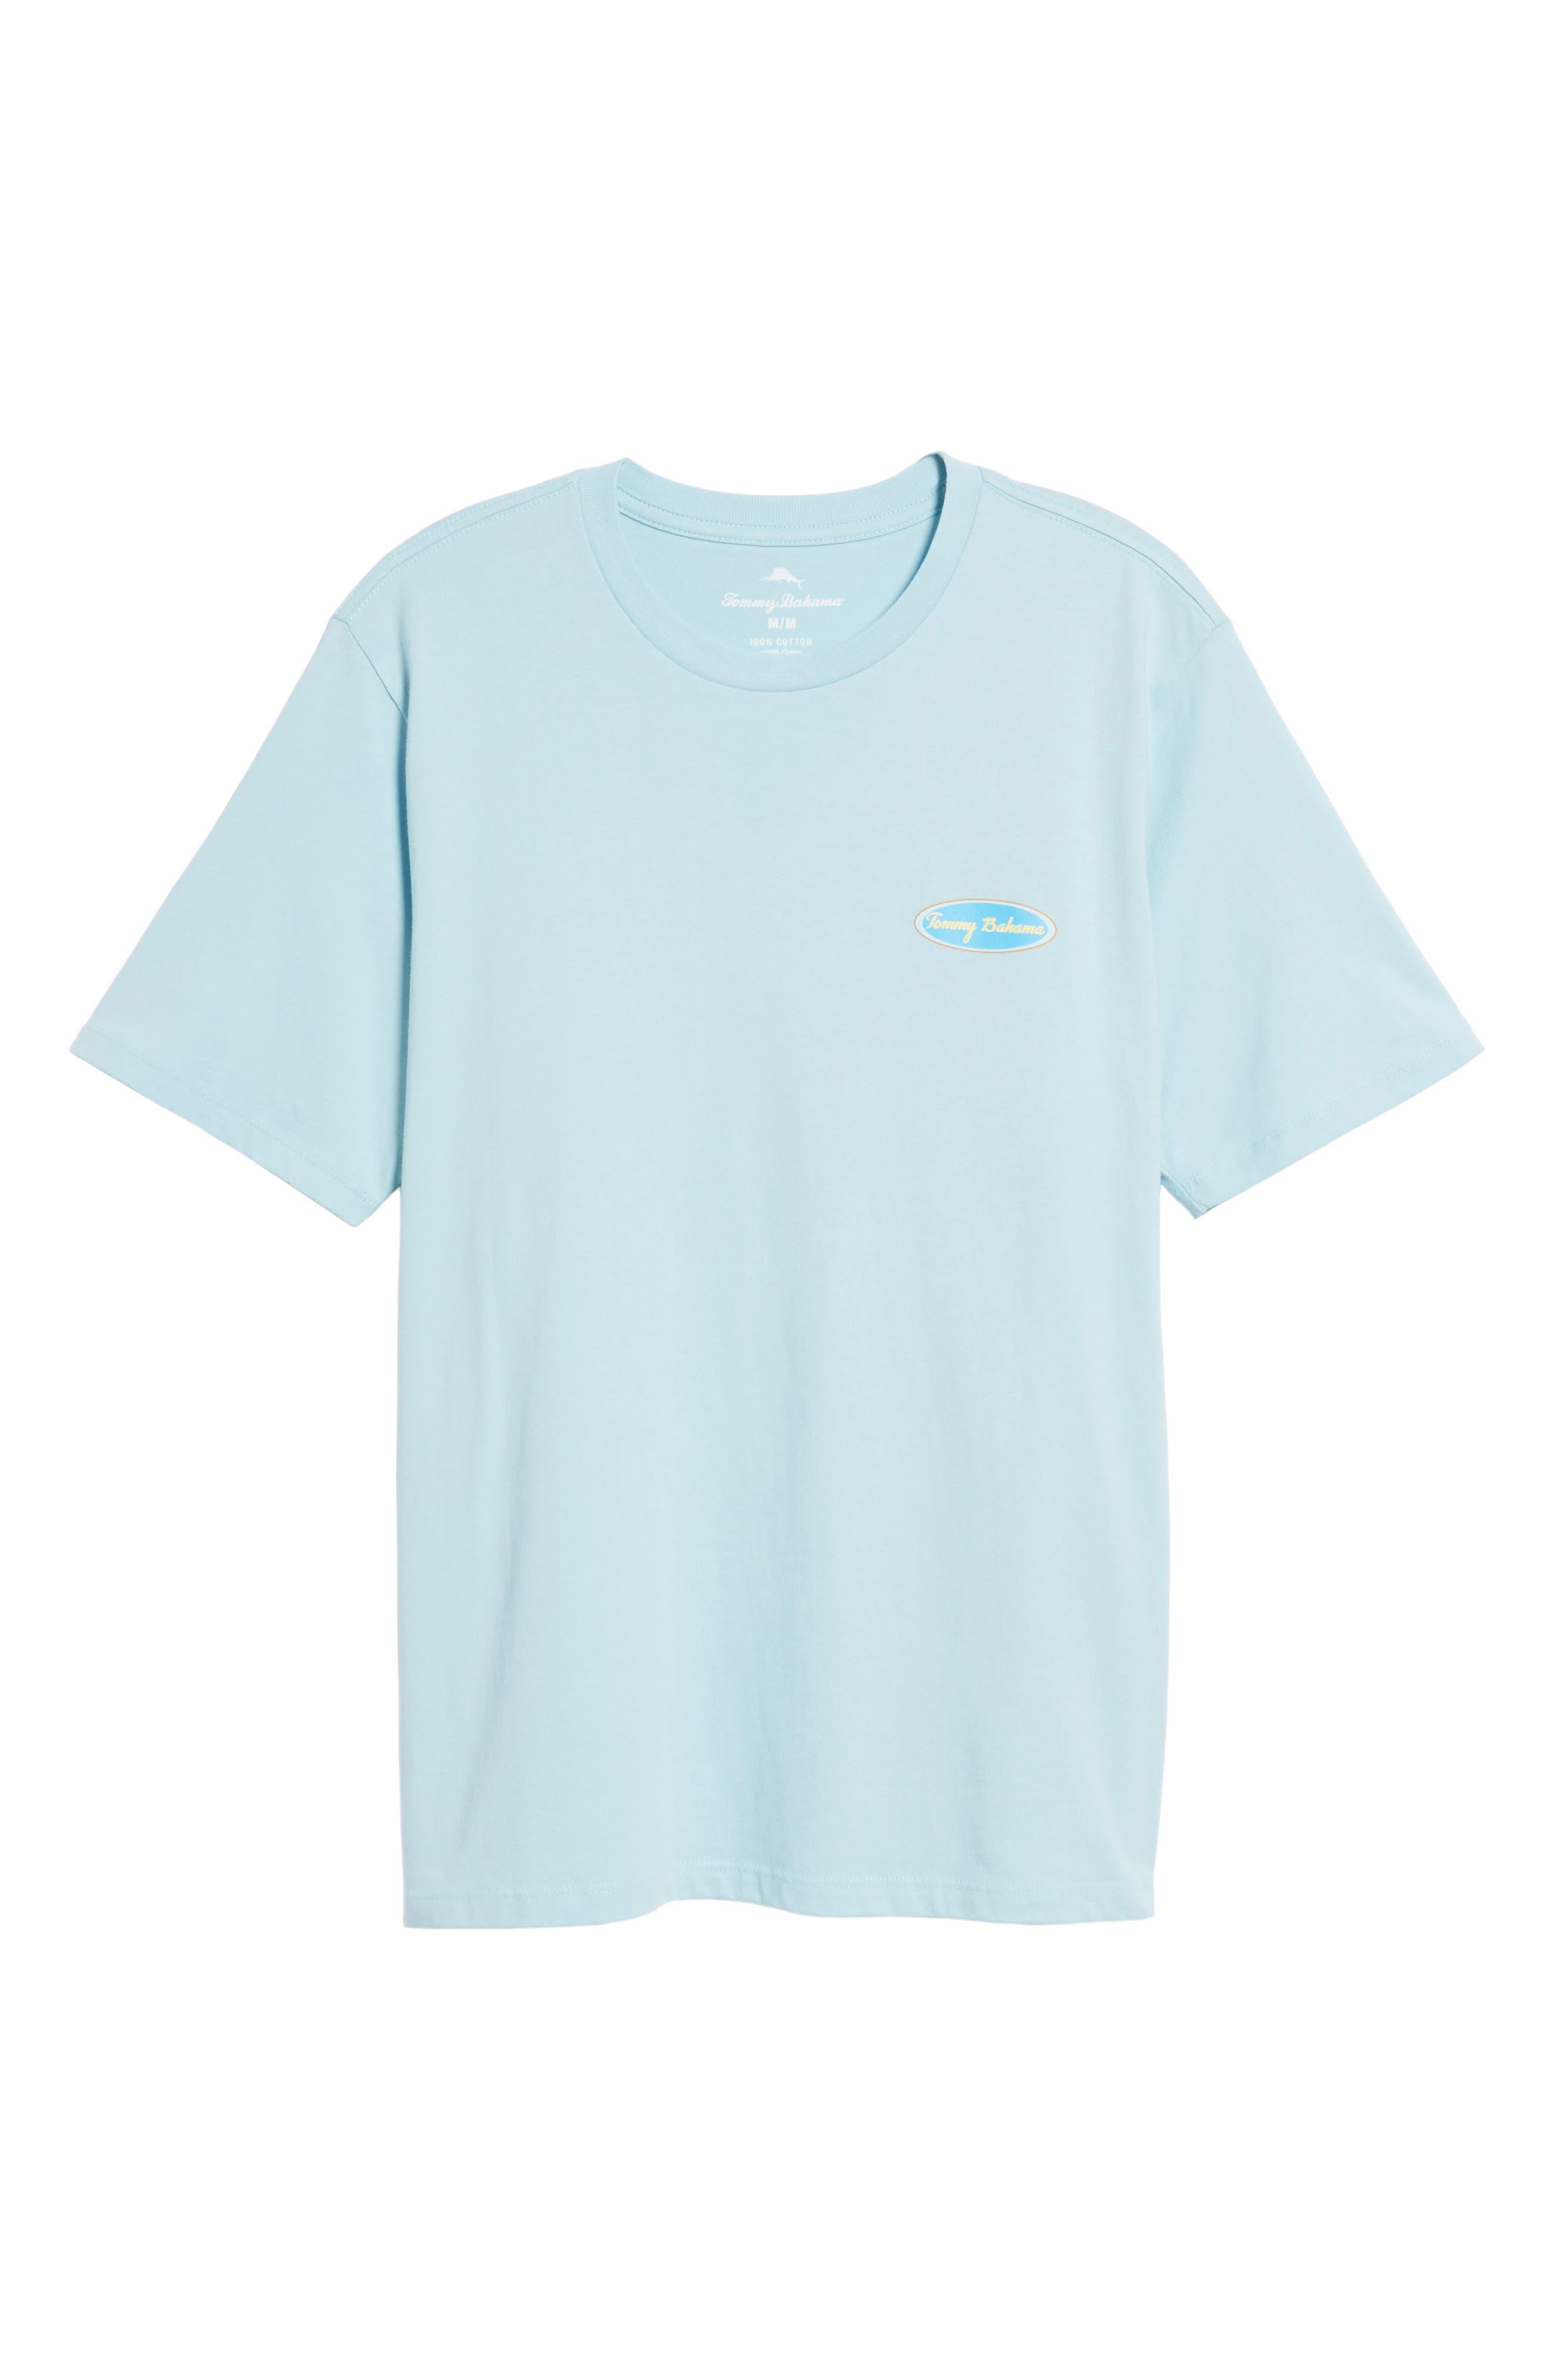 Suns Out T-Shirt,                             Alternate thumbnail 6, color,                             400